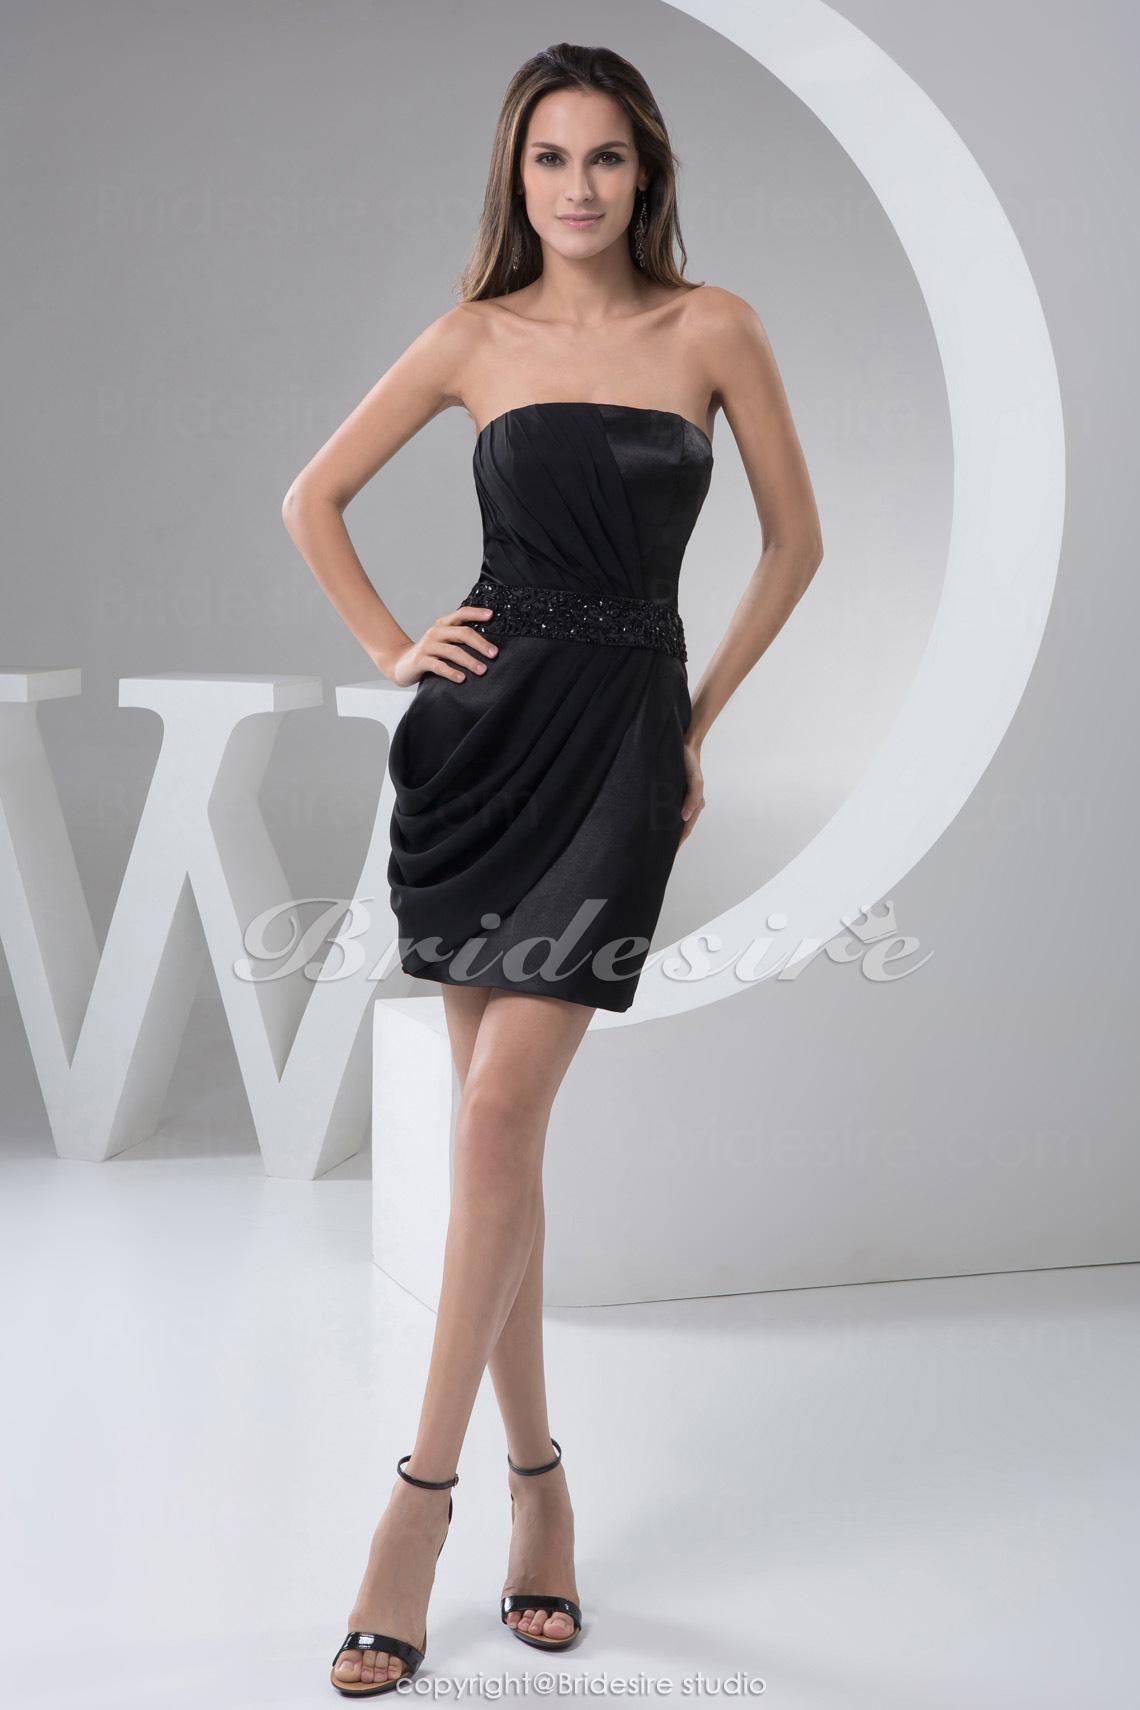 38eae8e1022546 Bridesire - Schede Kolom Strapless Korte broek   Mini Mouwloos Chiffon Satijn  Kleding  BD4914  - €67.77   Bridesire